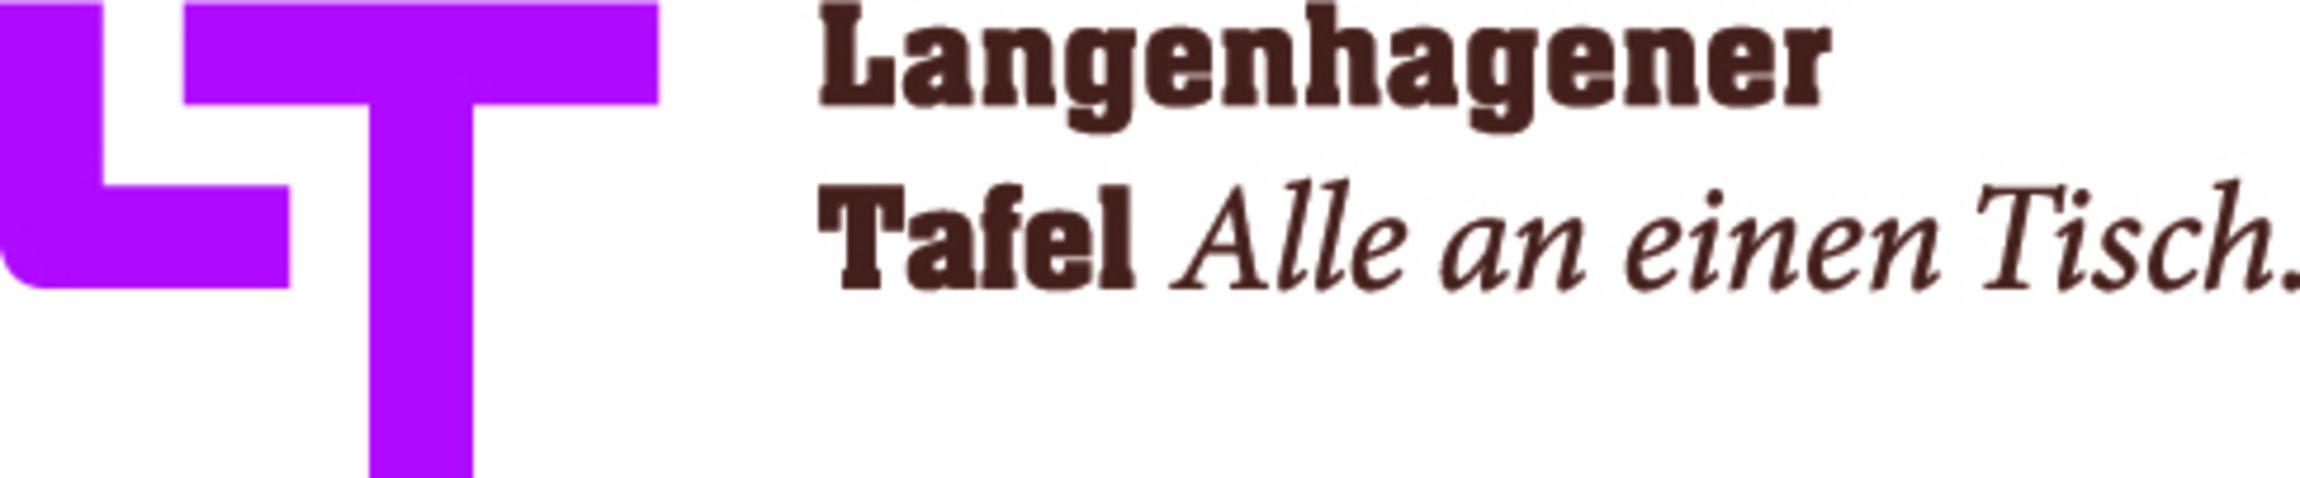 Logo Langenhagener Tafel